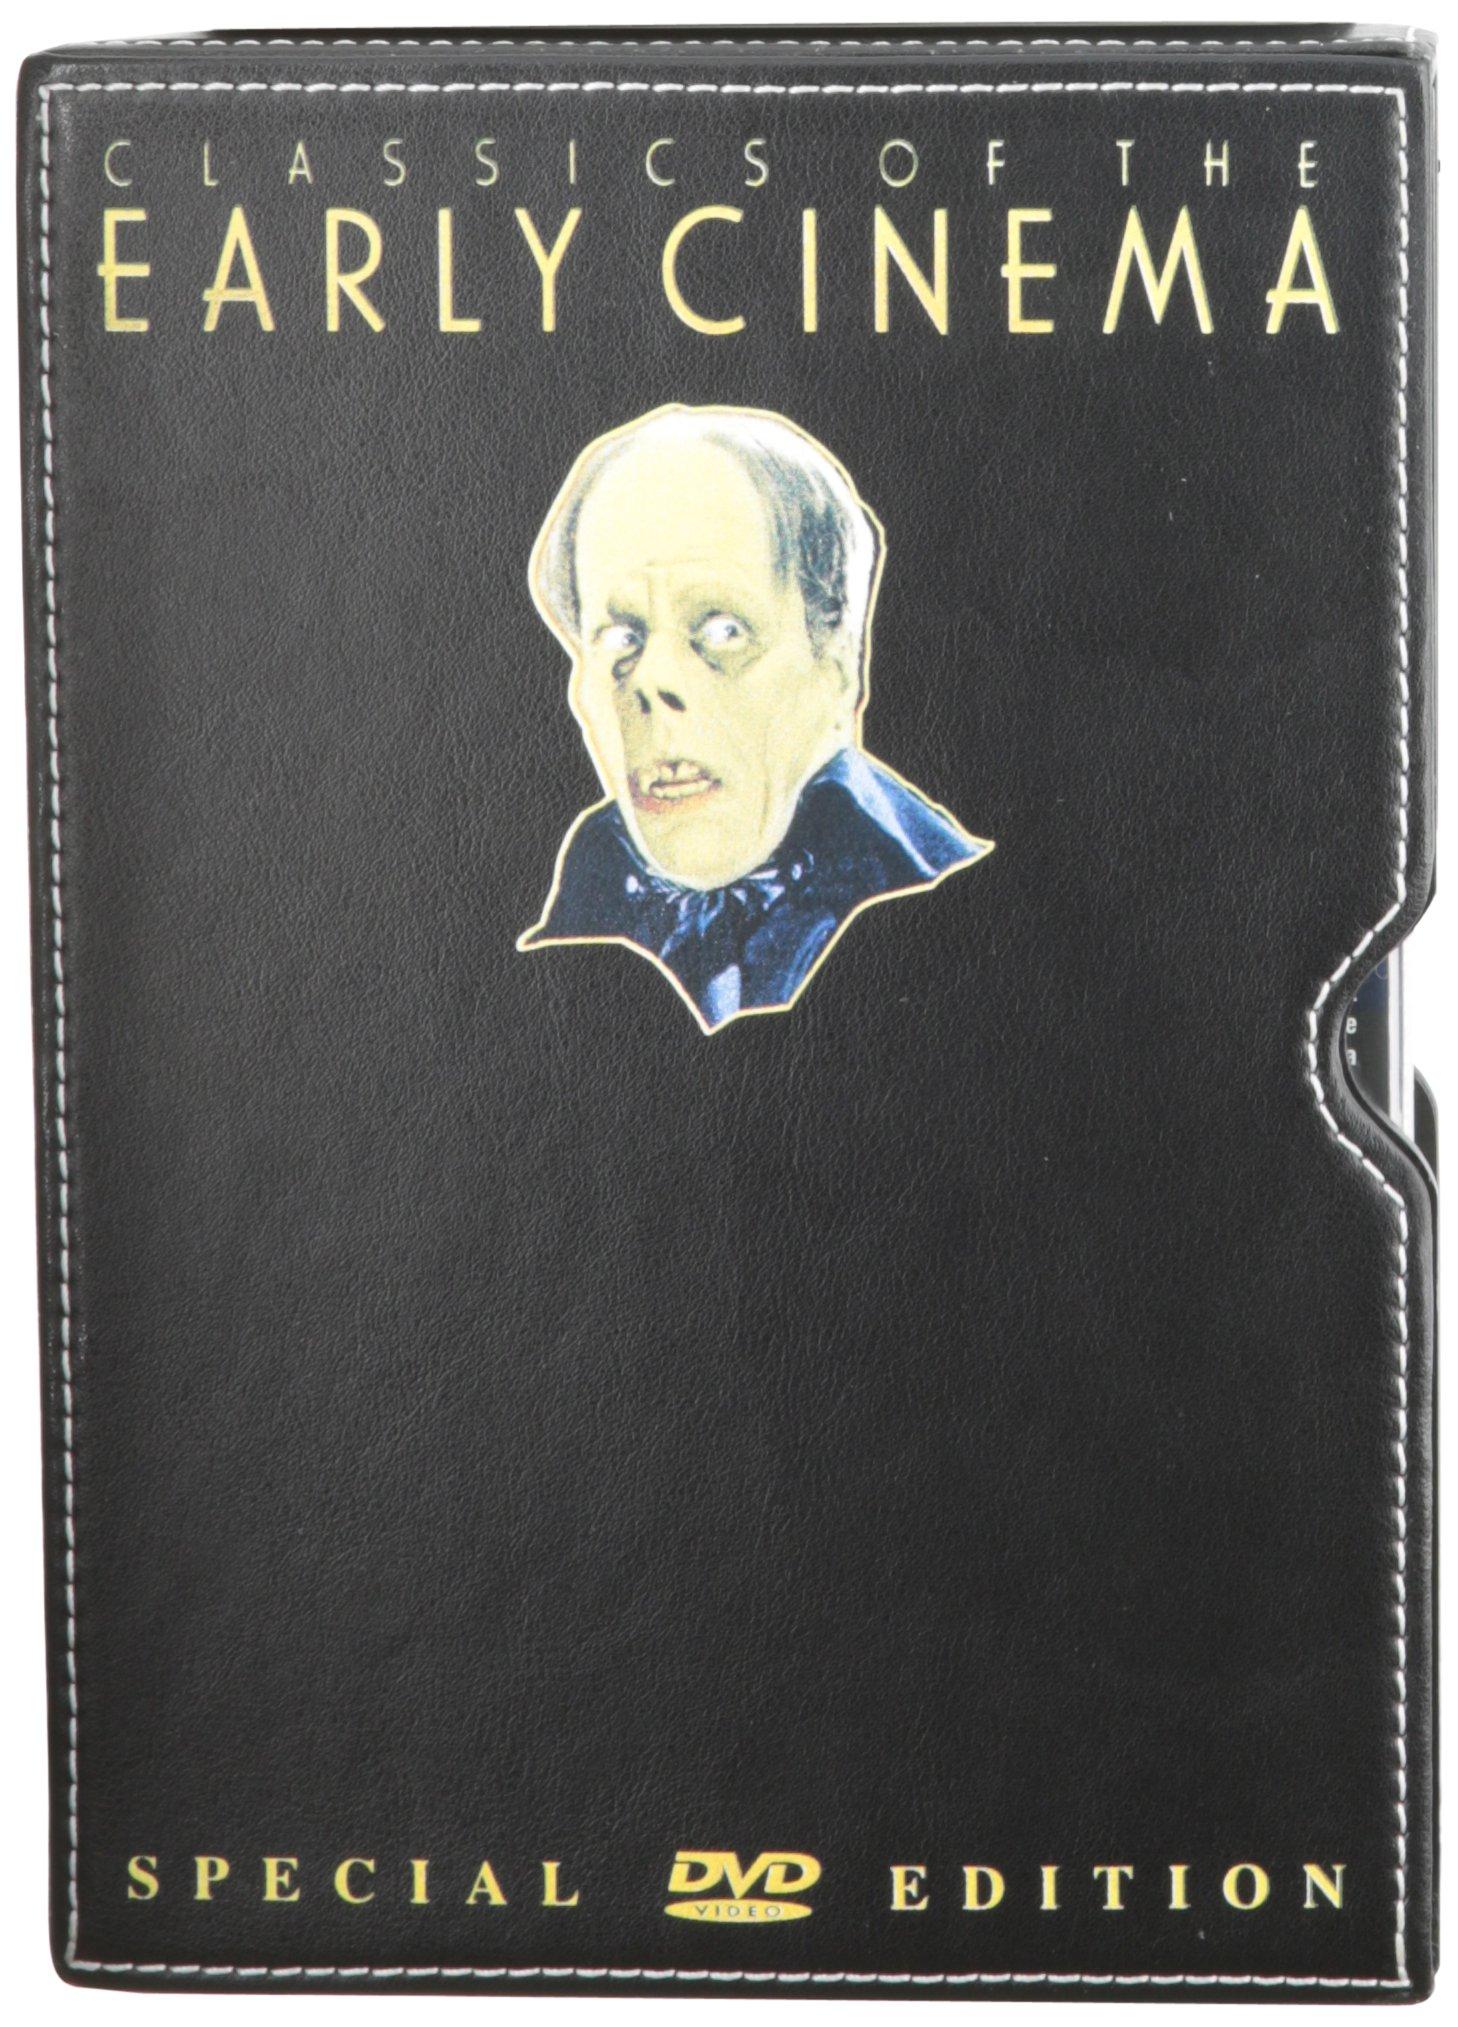 Classics of Early Cinema (4-DVD Leather Box Set)